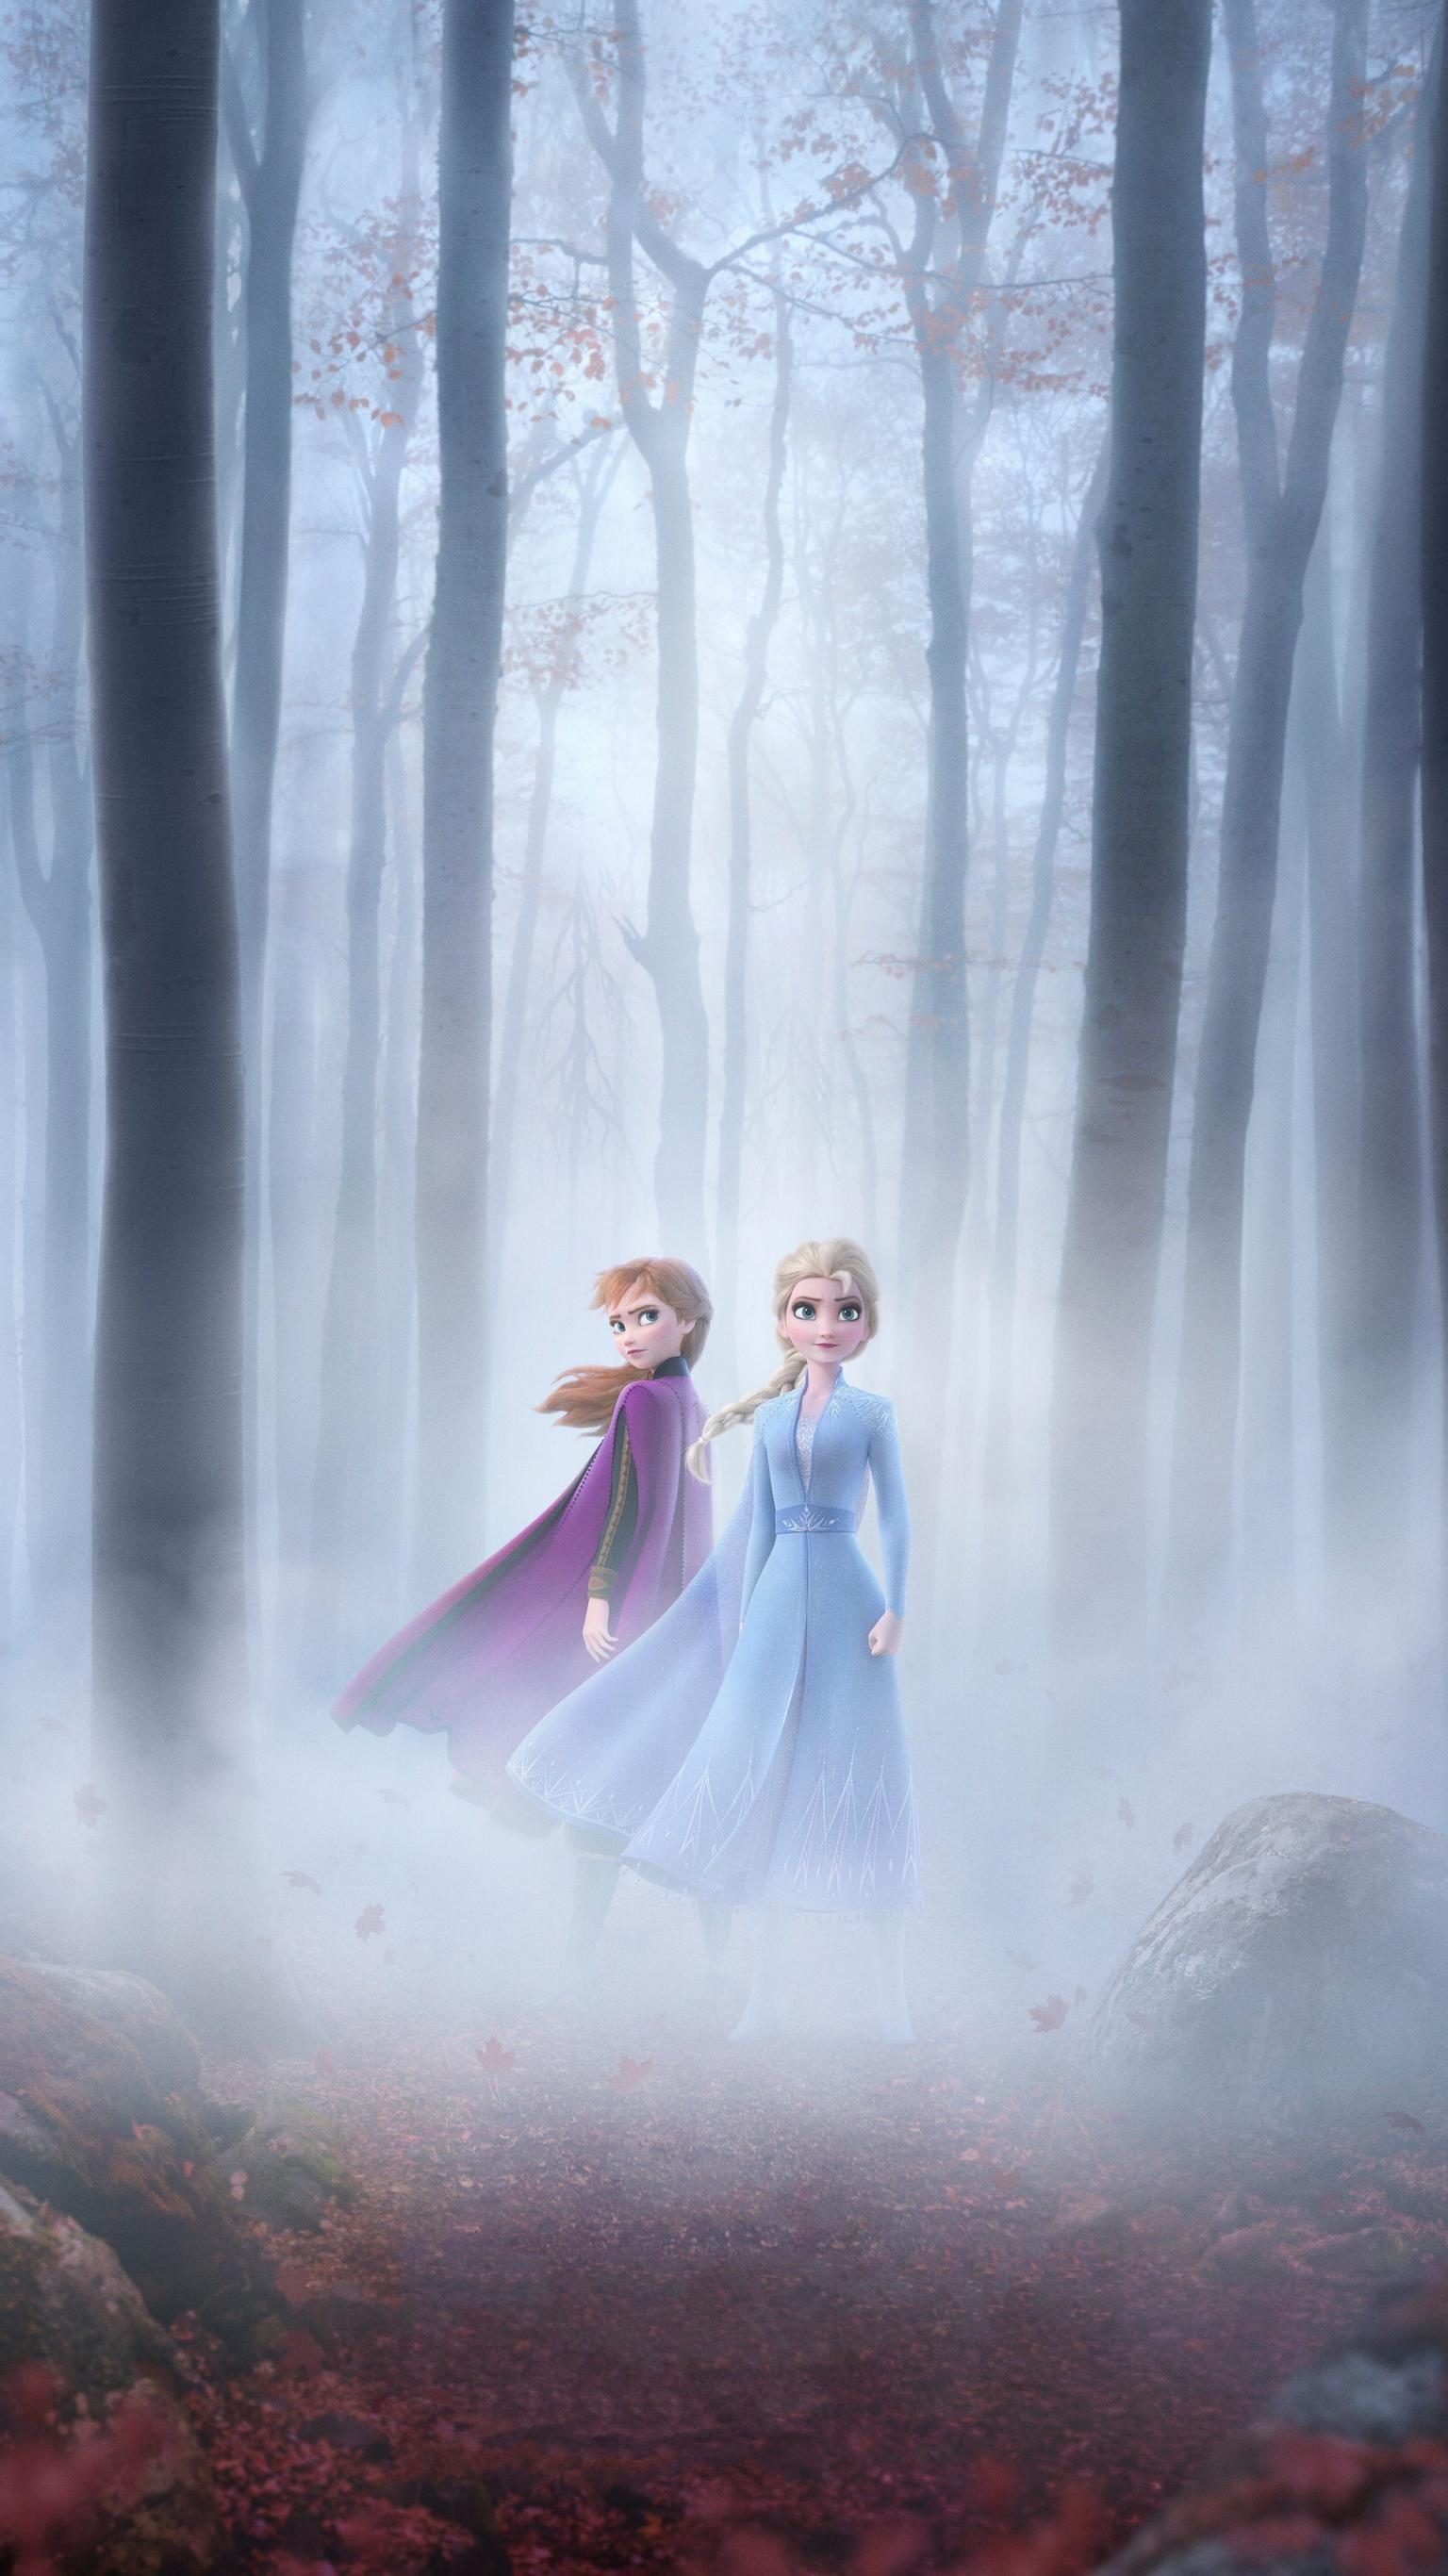 Frozen II (2019) Phone Wallpaper Мультики диснея, Фильм